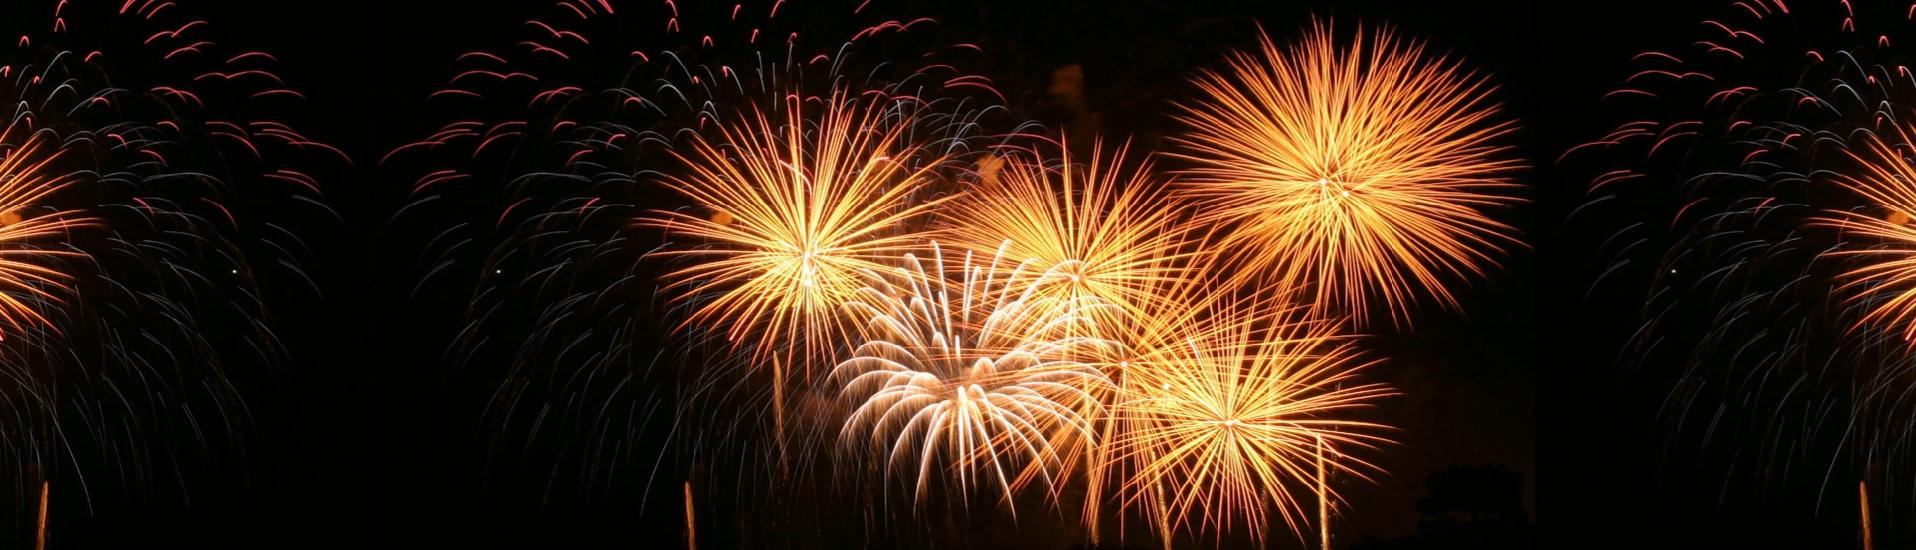 Wokingham Fireworks Spectacular Fireworks Display Saturday 6 November 2021